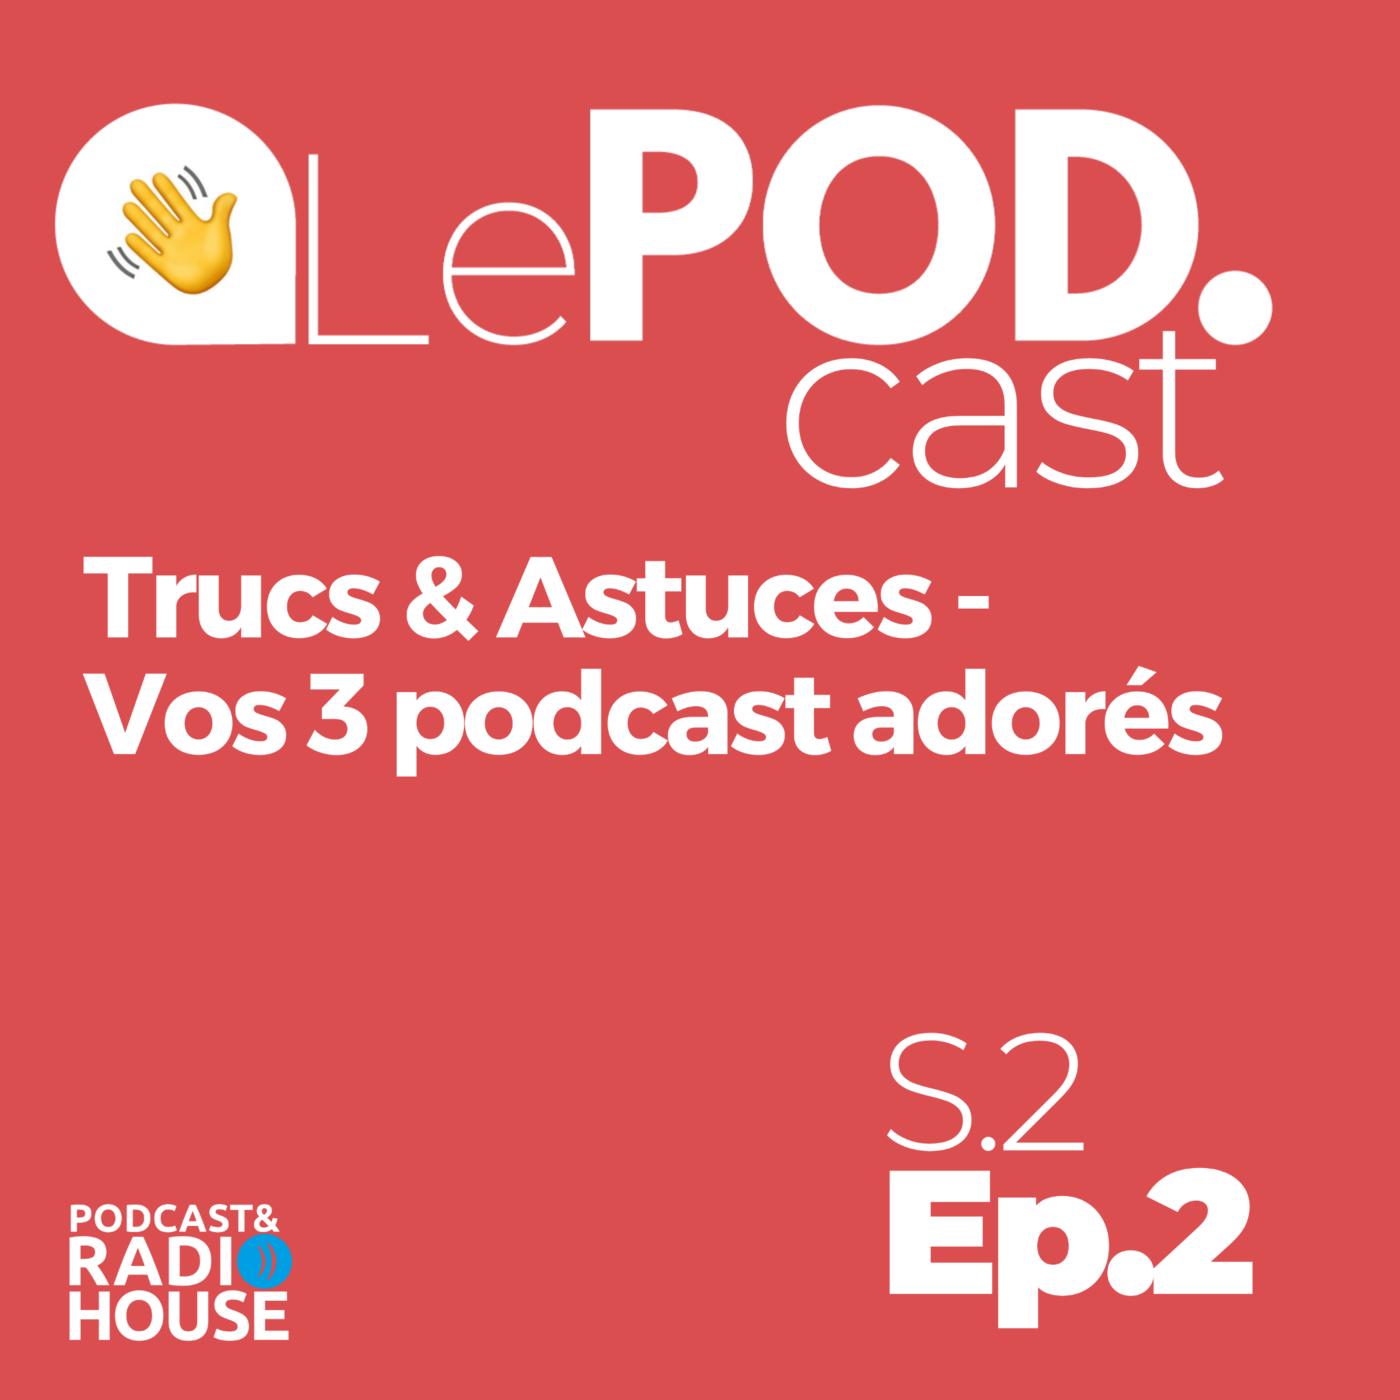 EP.2 - Trucs & Astuces - Vos 3 podcast adorés - Le POD.